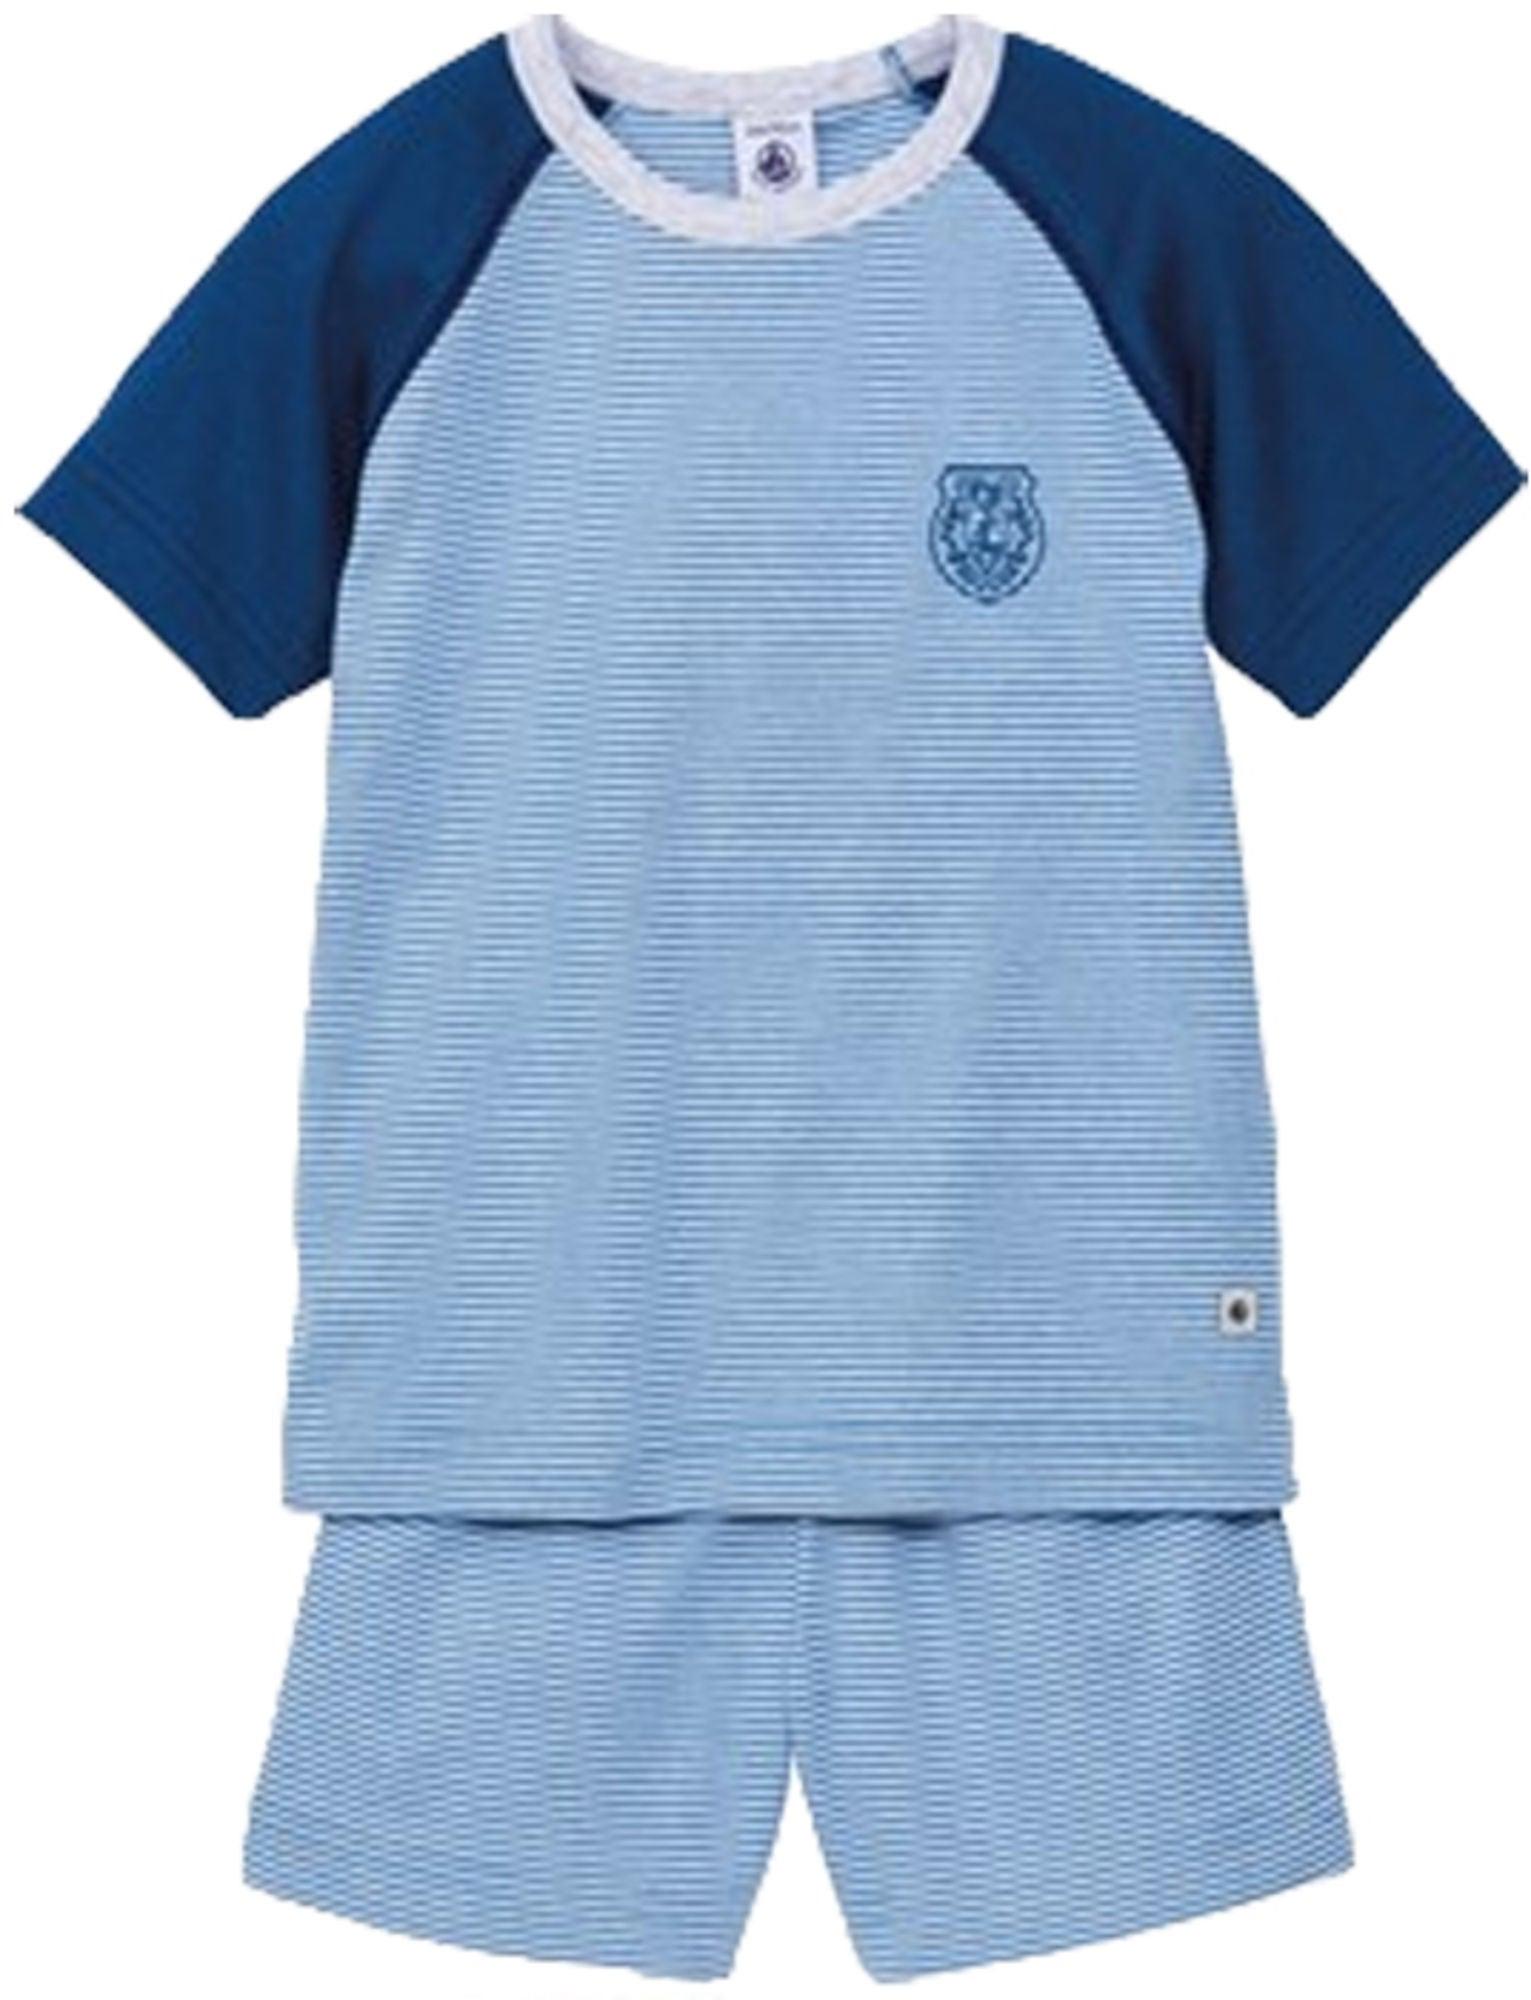 Köp Petit Bateau Pyjamas Kort Blå  7dae1d04b97c9